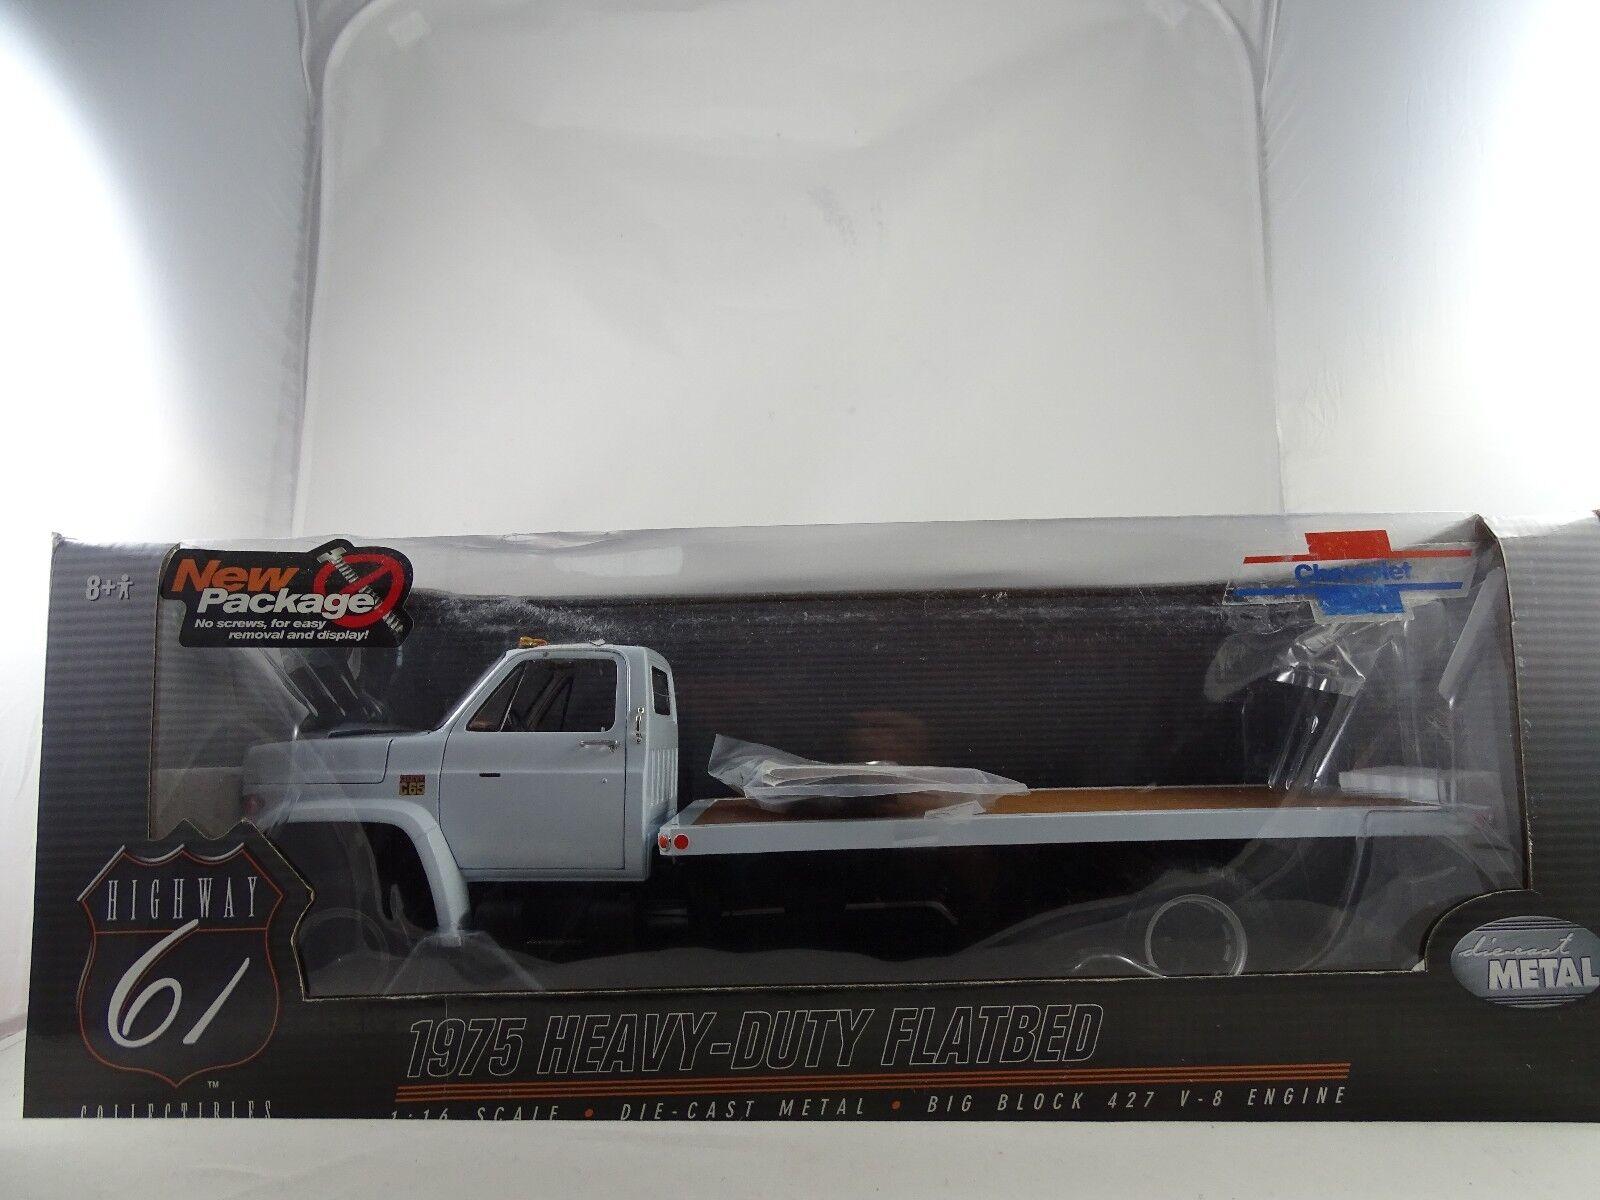 1 16 Highway 61 - 1975 Chevrolet C65 Heavy-Duty à Plat Blancheur Rare Neuf